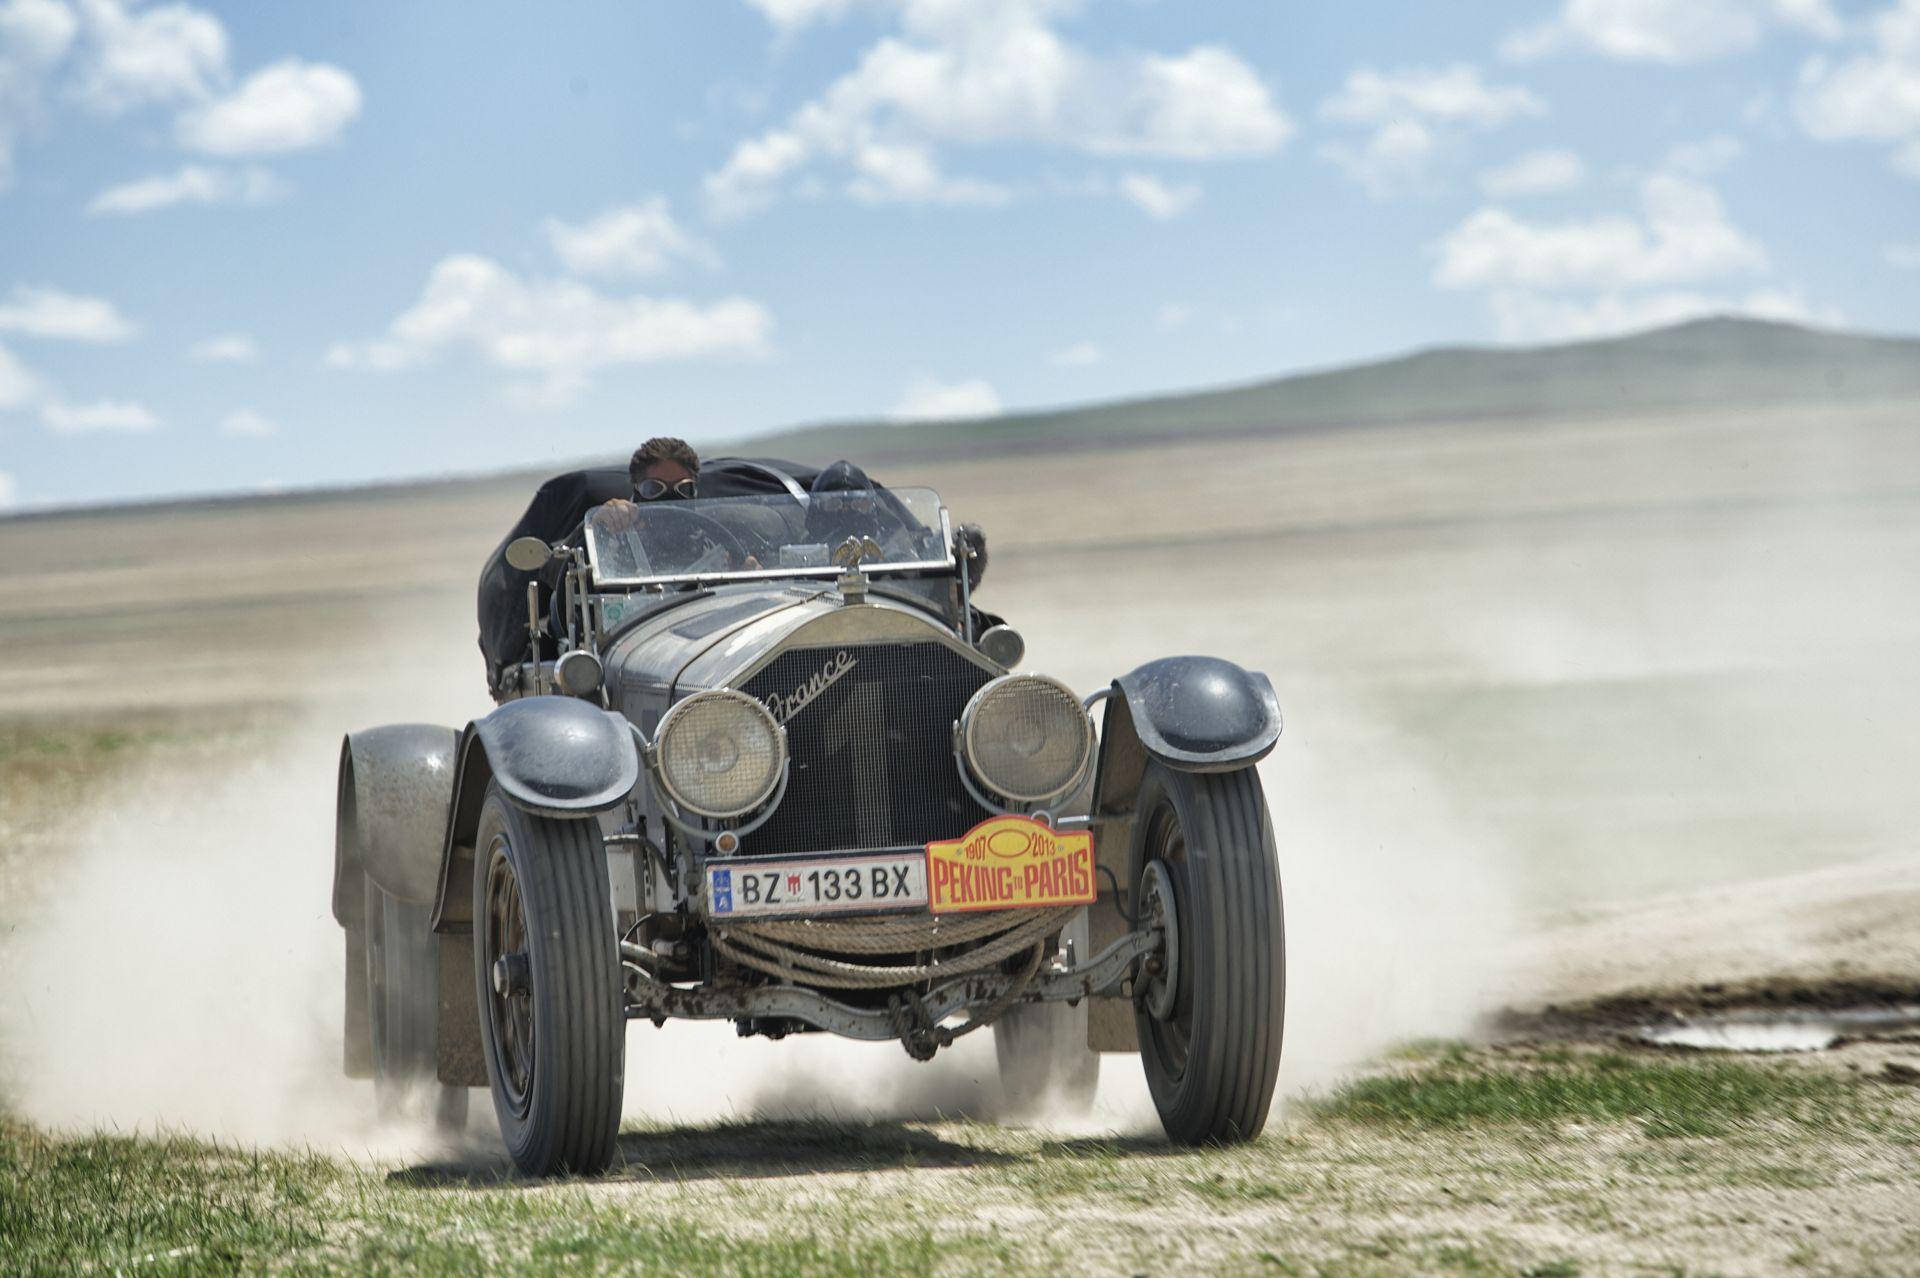 Paris to Peking Rally 2013 Car 99, a 1950 Bentley MKV1 Special ...